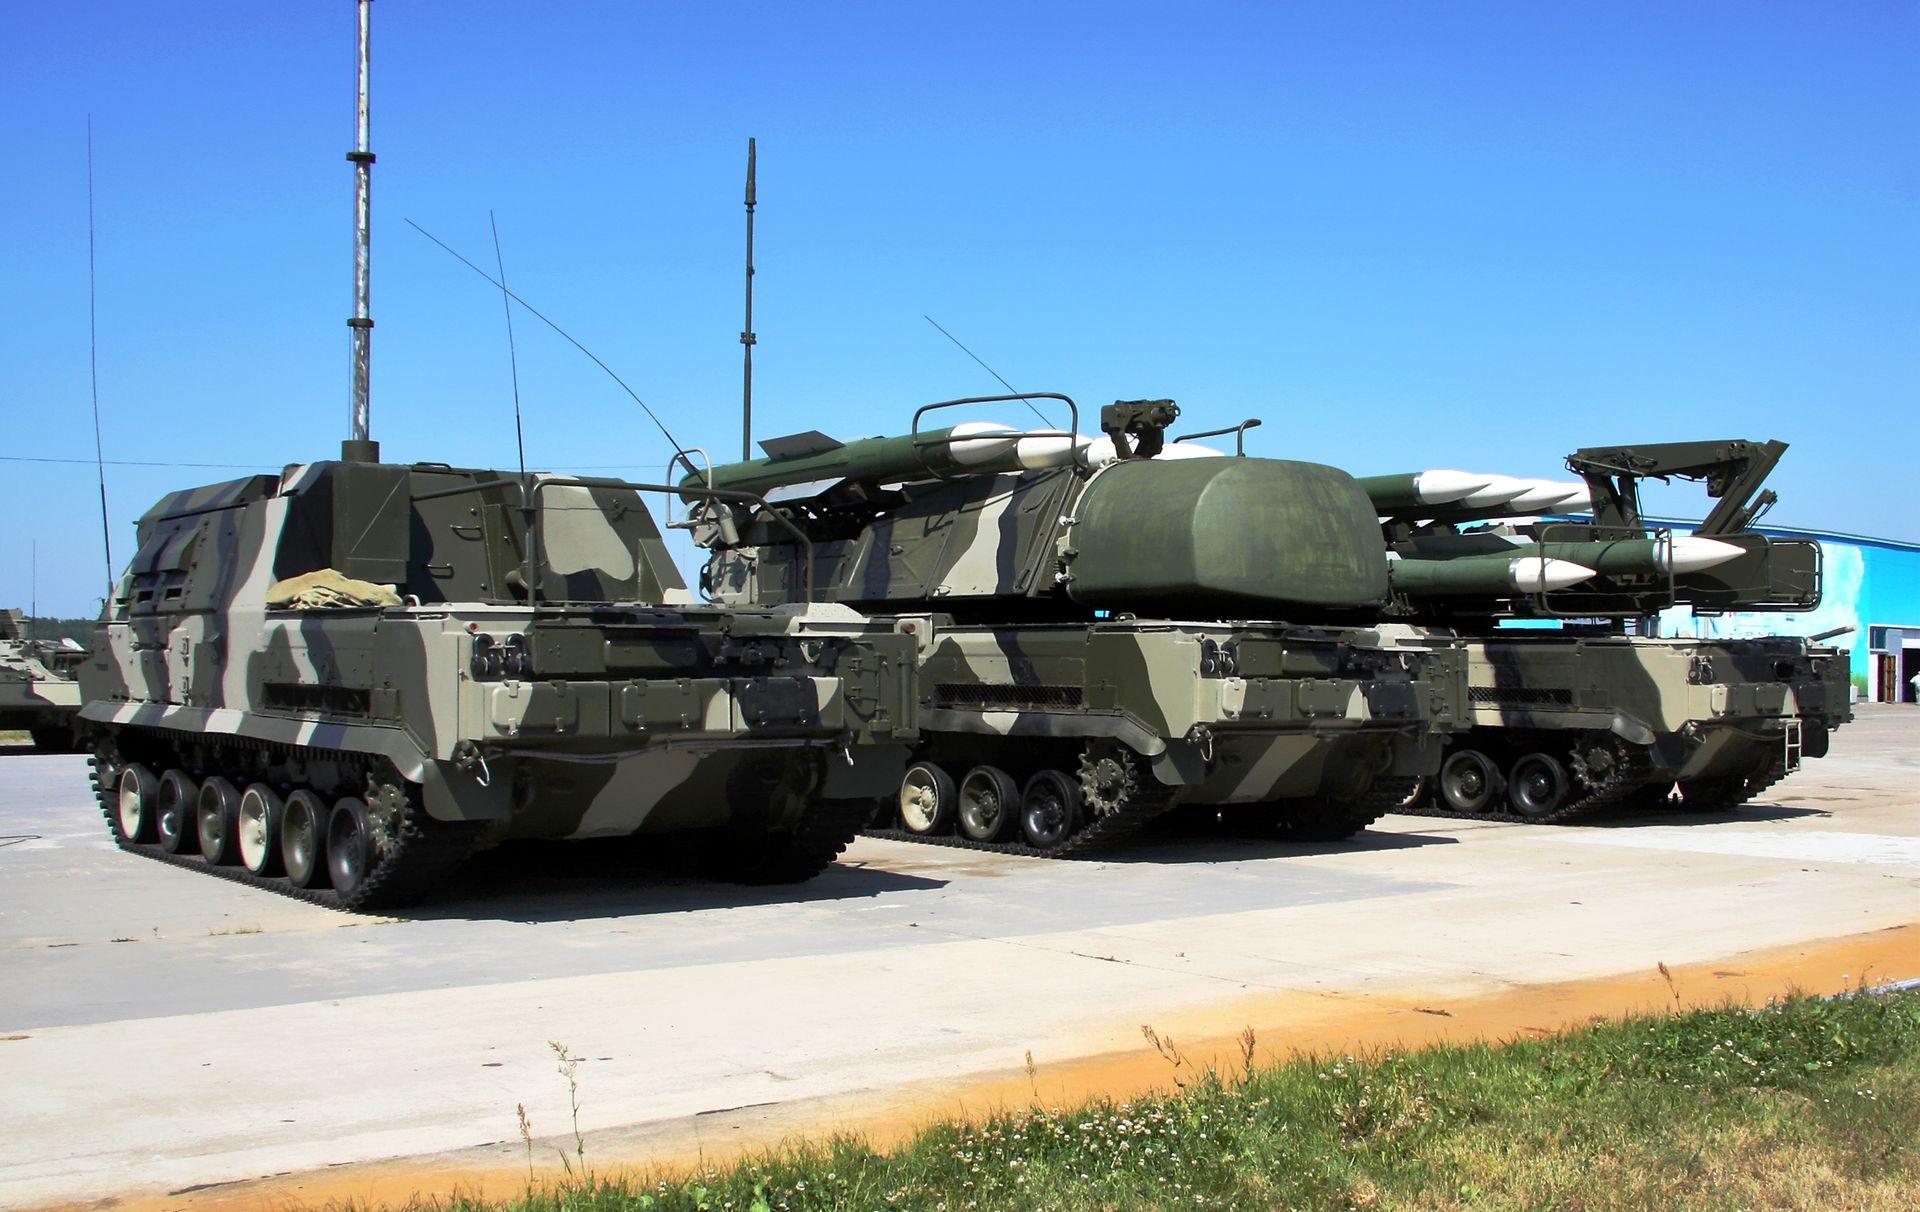 Buk Missile System Wikipedia